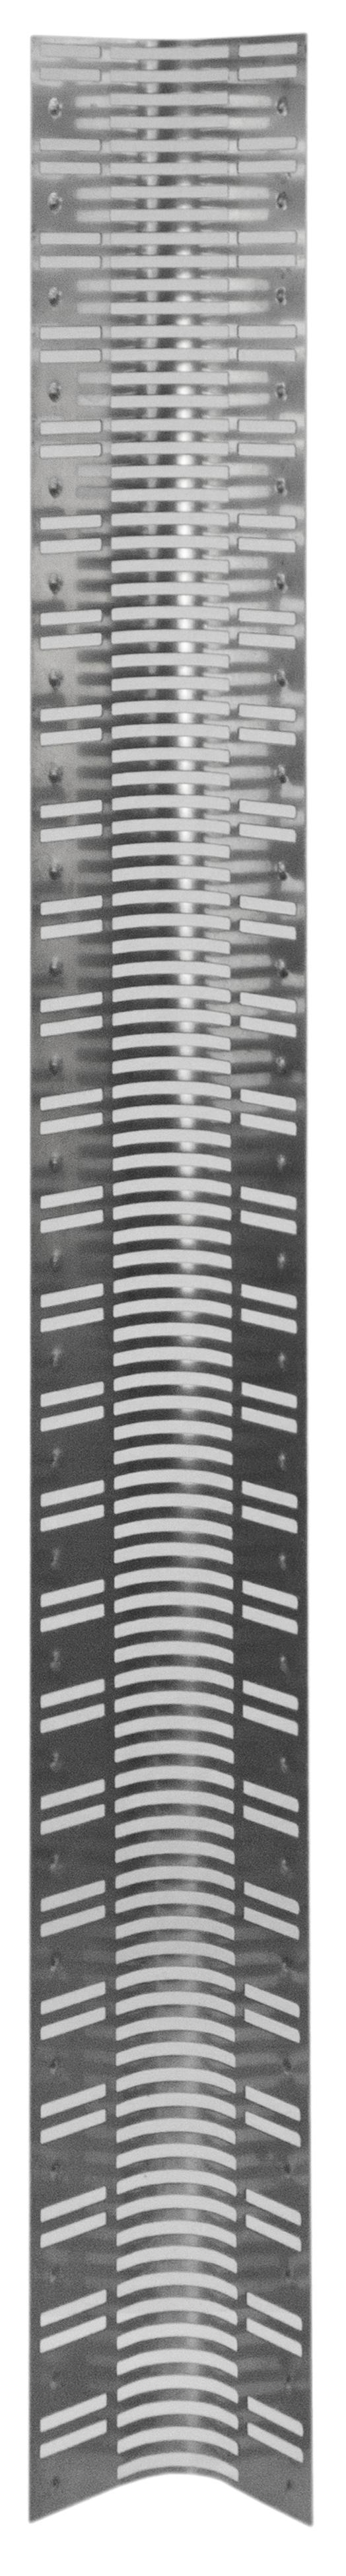 SpouwSafe 50 cm